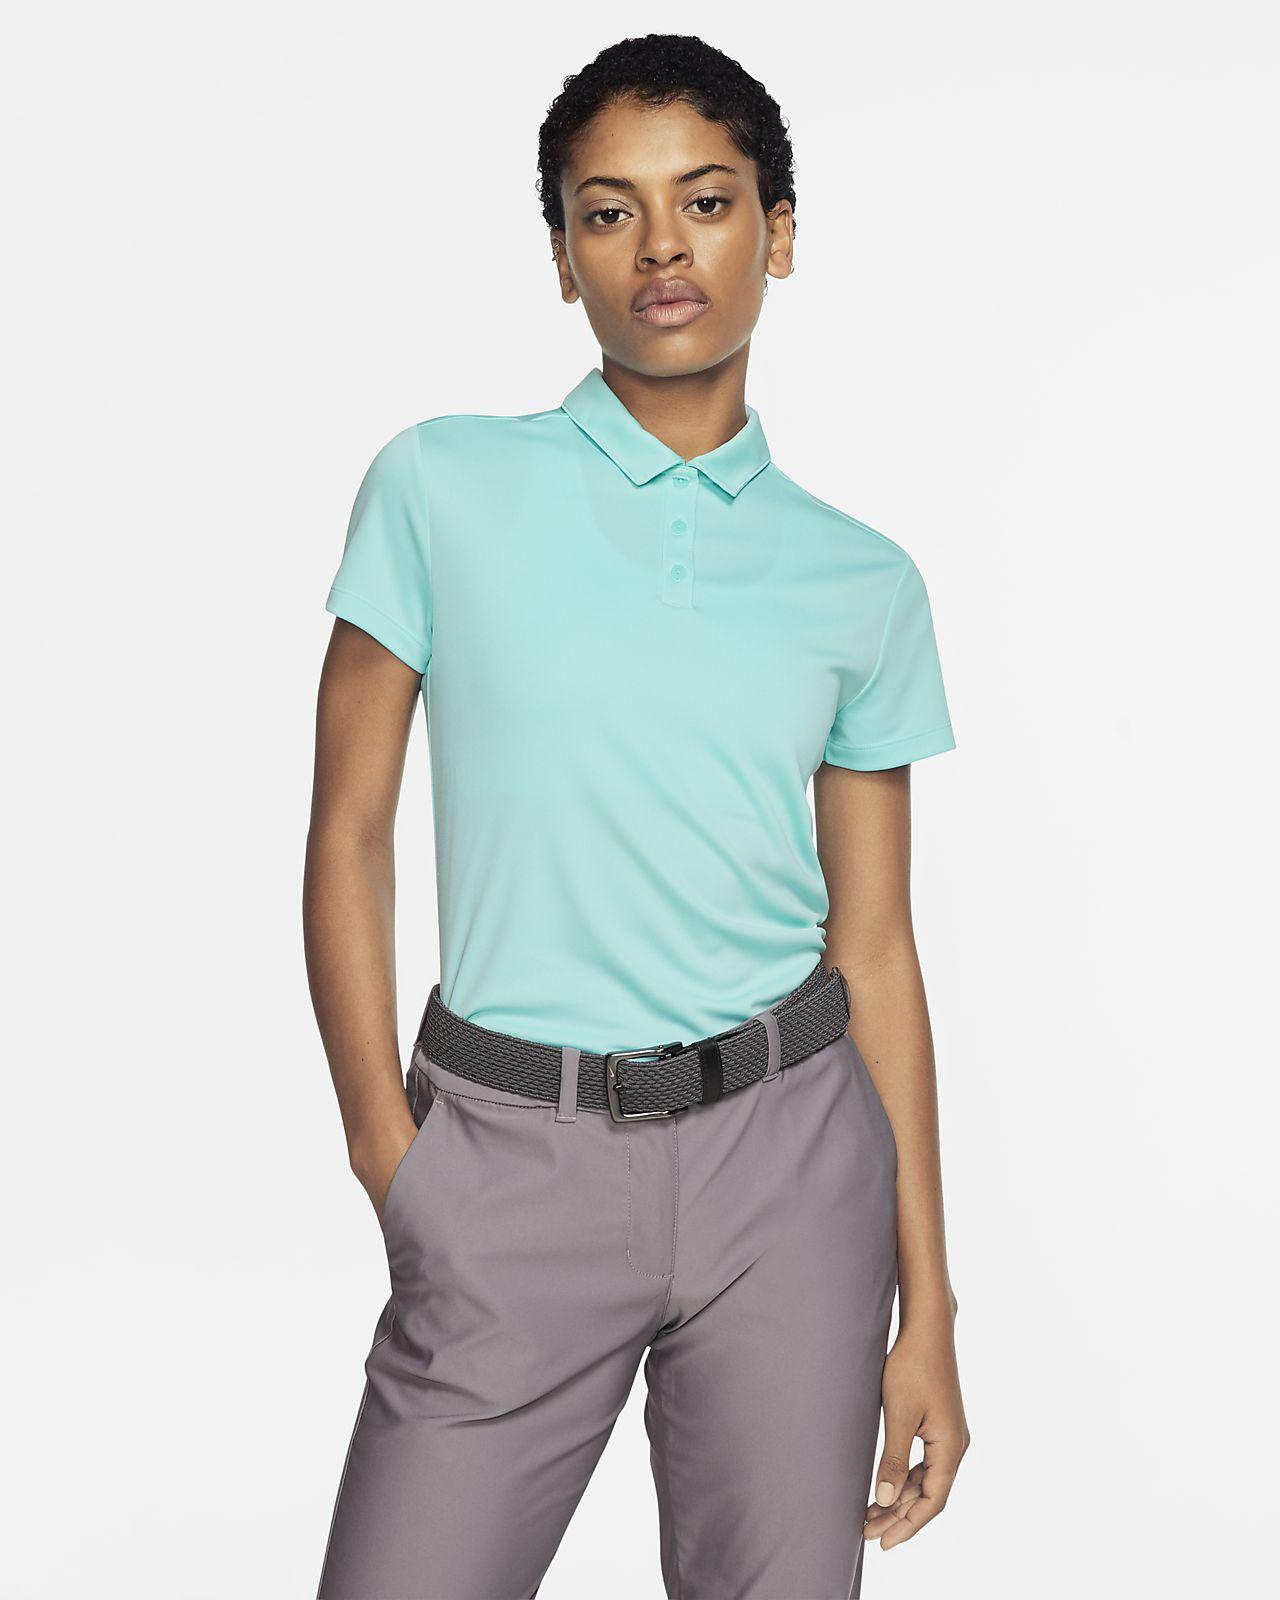 Nike Dri-FIT golfskjorte til dame